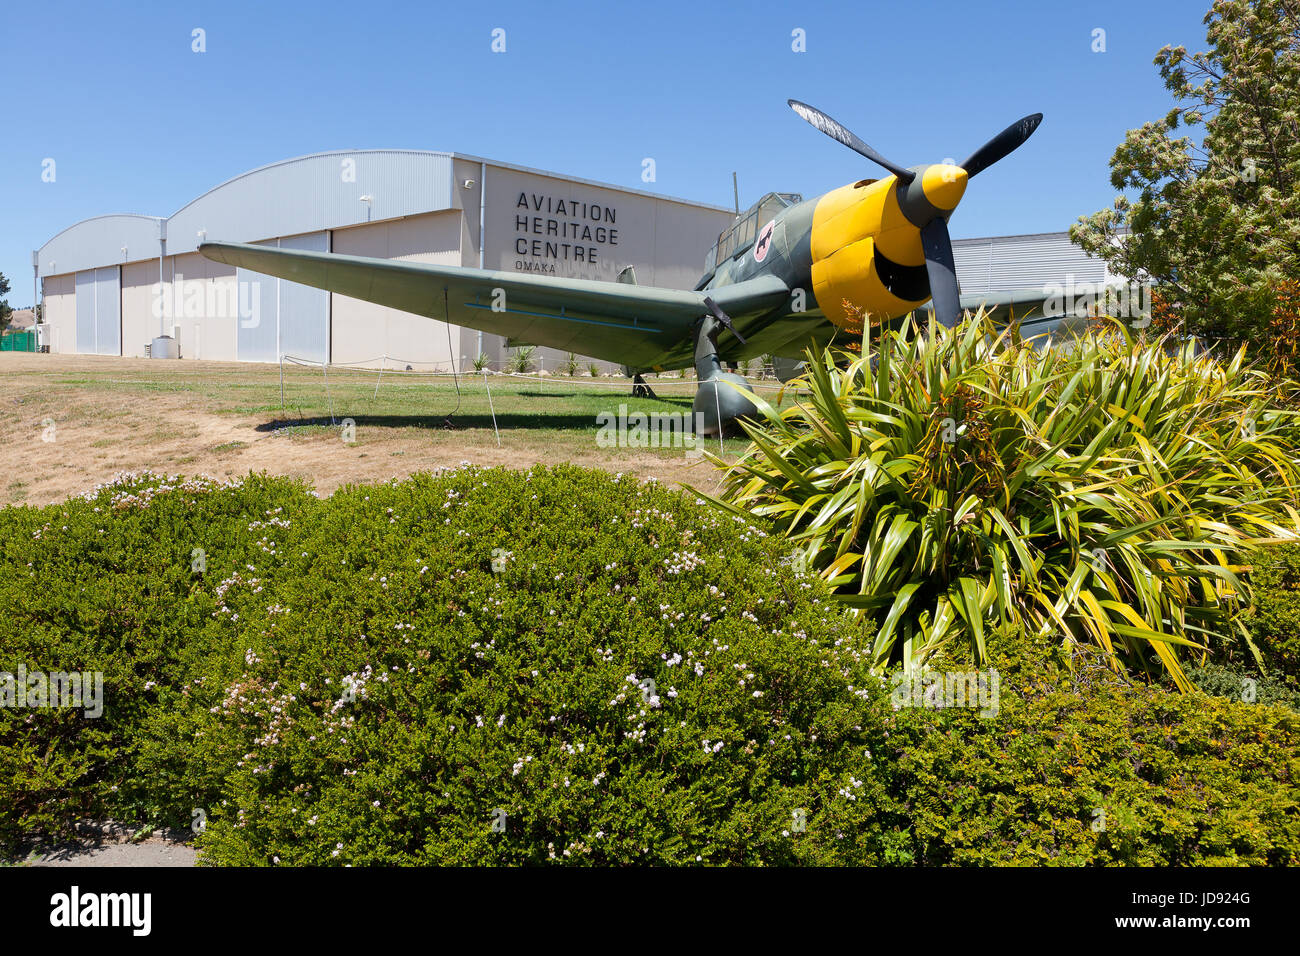 Omaka Aviation Heritage Centre, Omaka, New Zealand - Stock Image